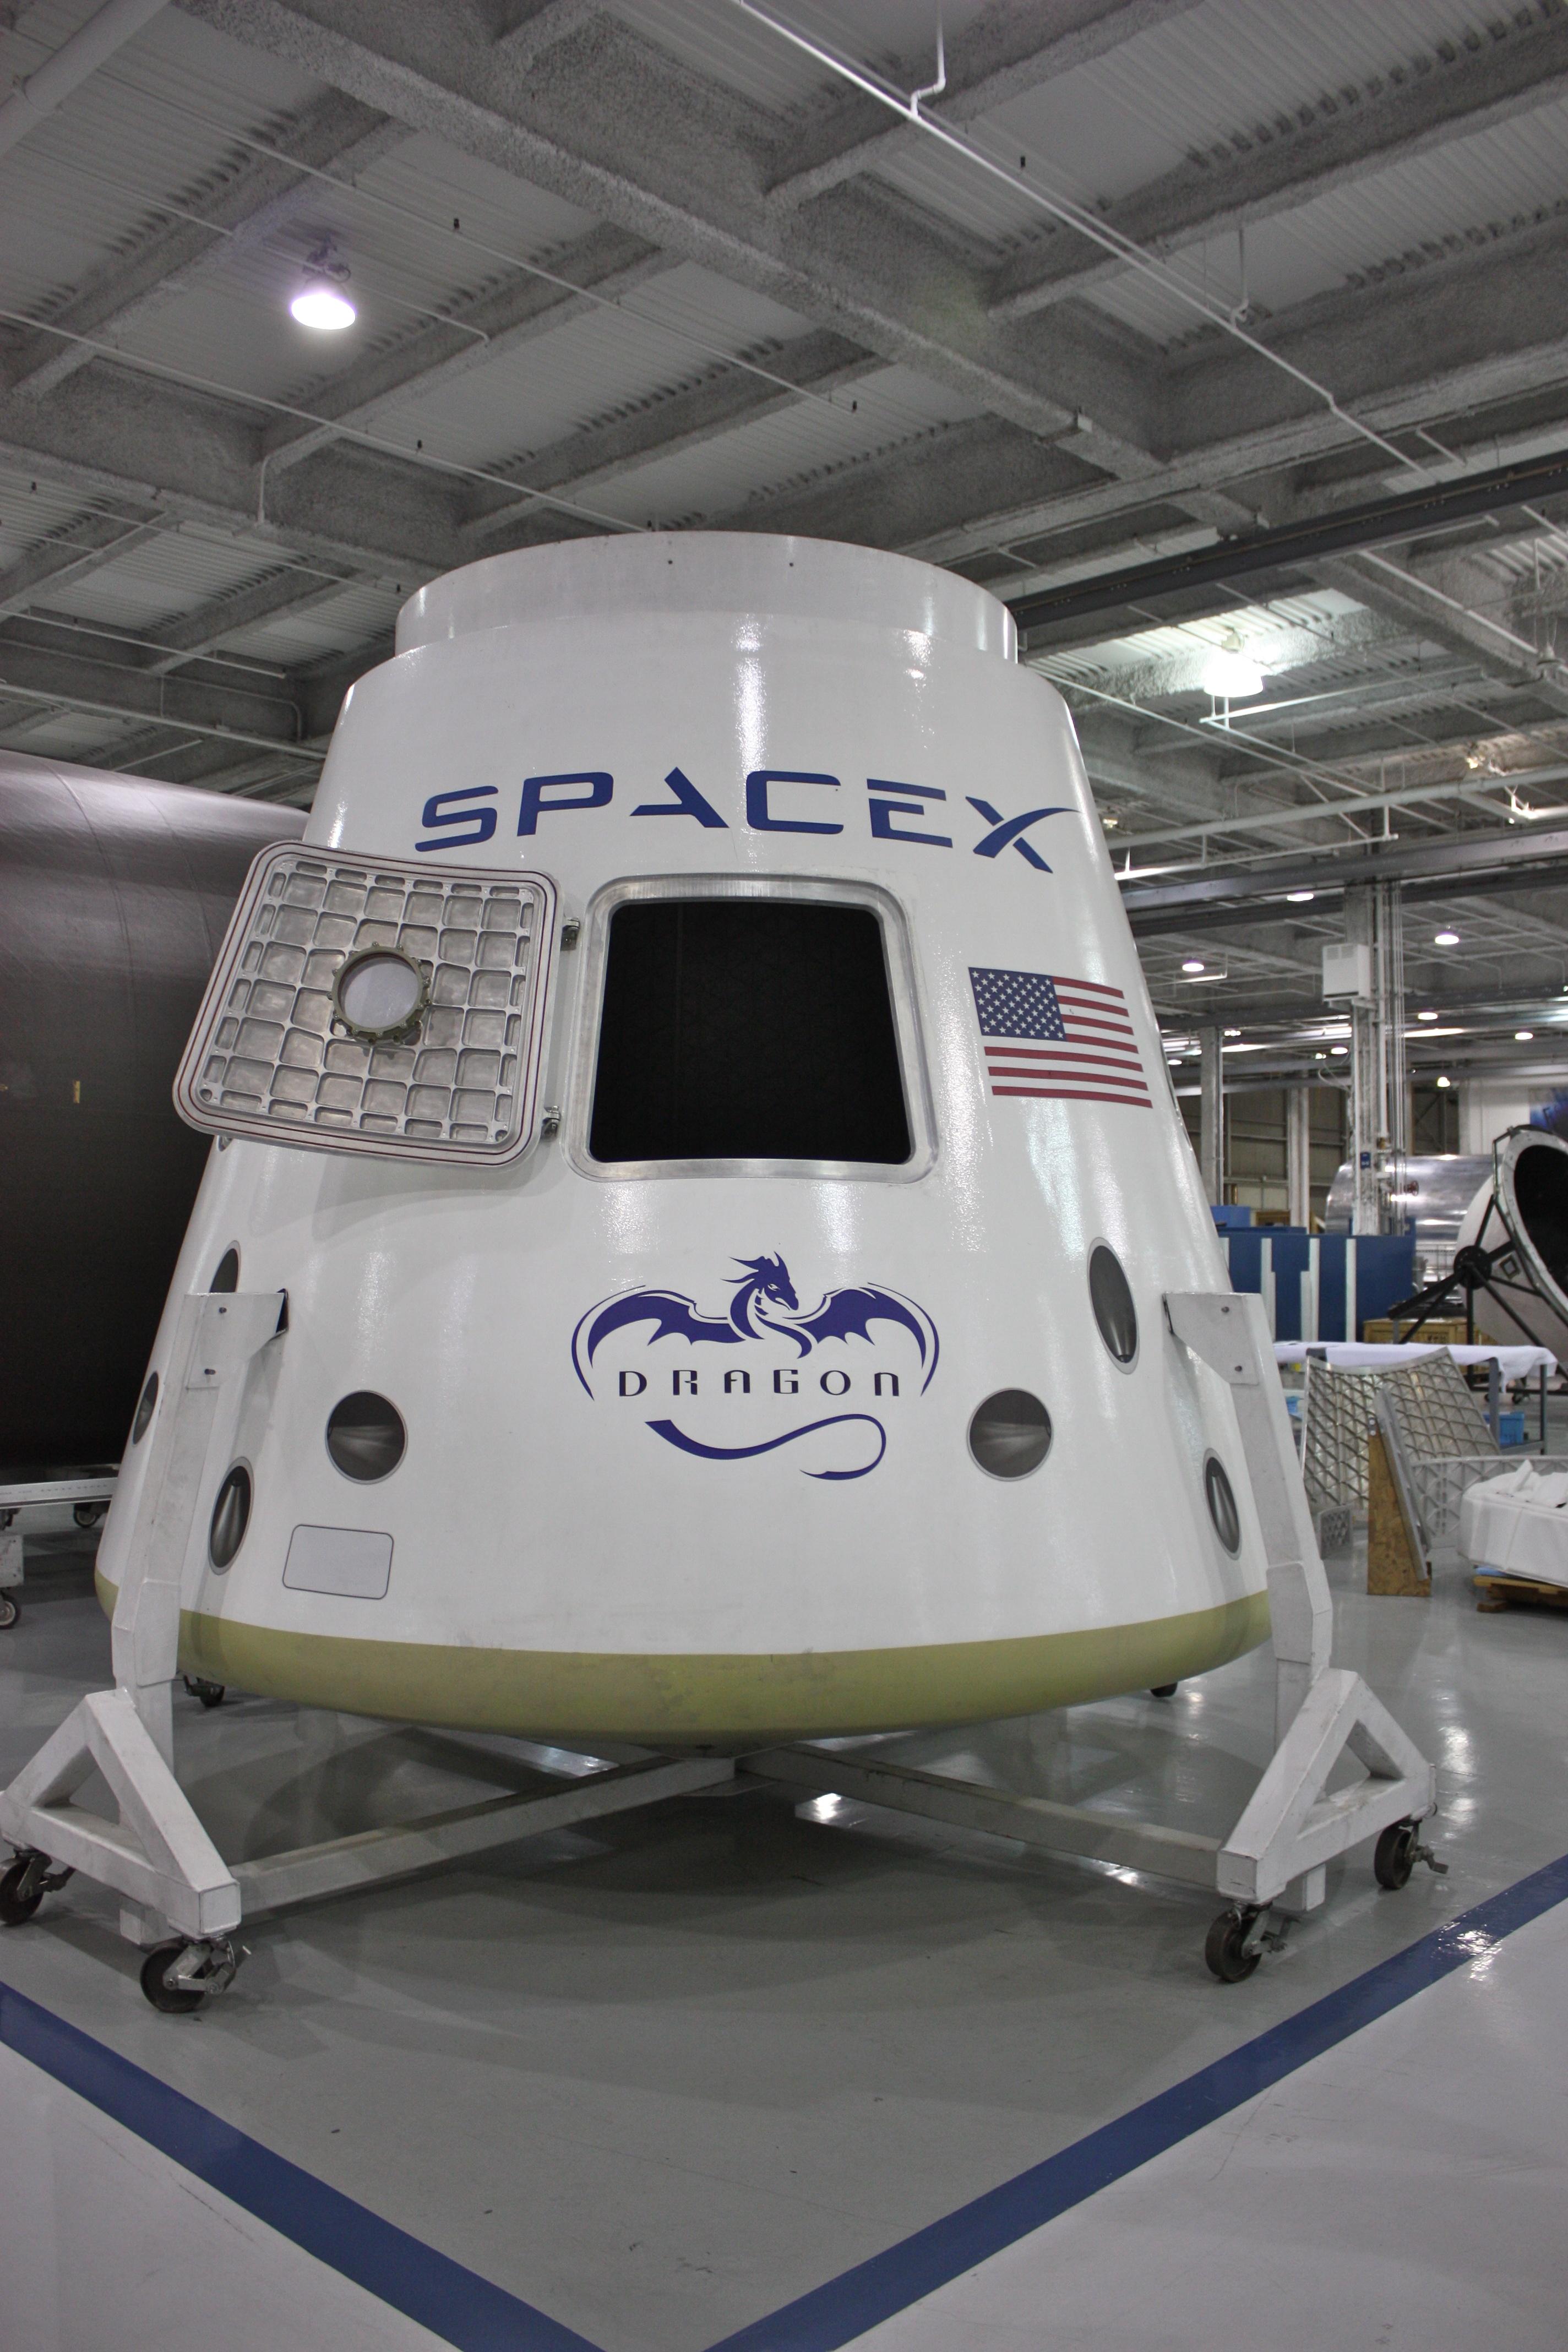 File:SpaceX Dragon.jpg - Wikipedia